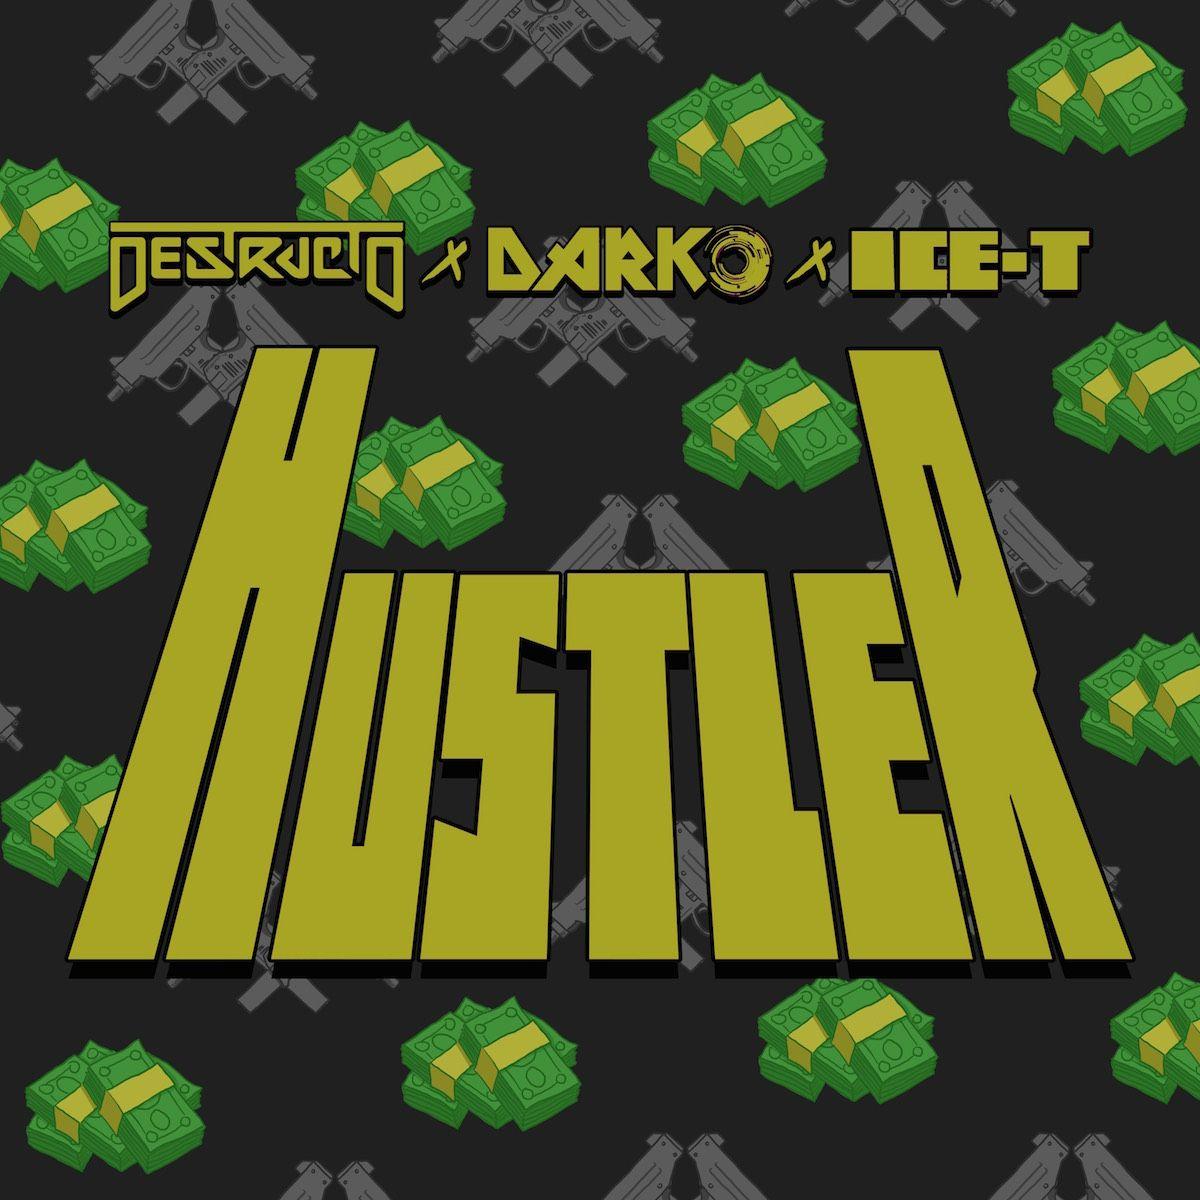 hustler_small